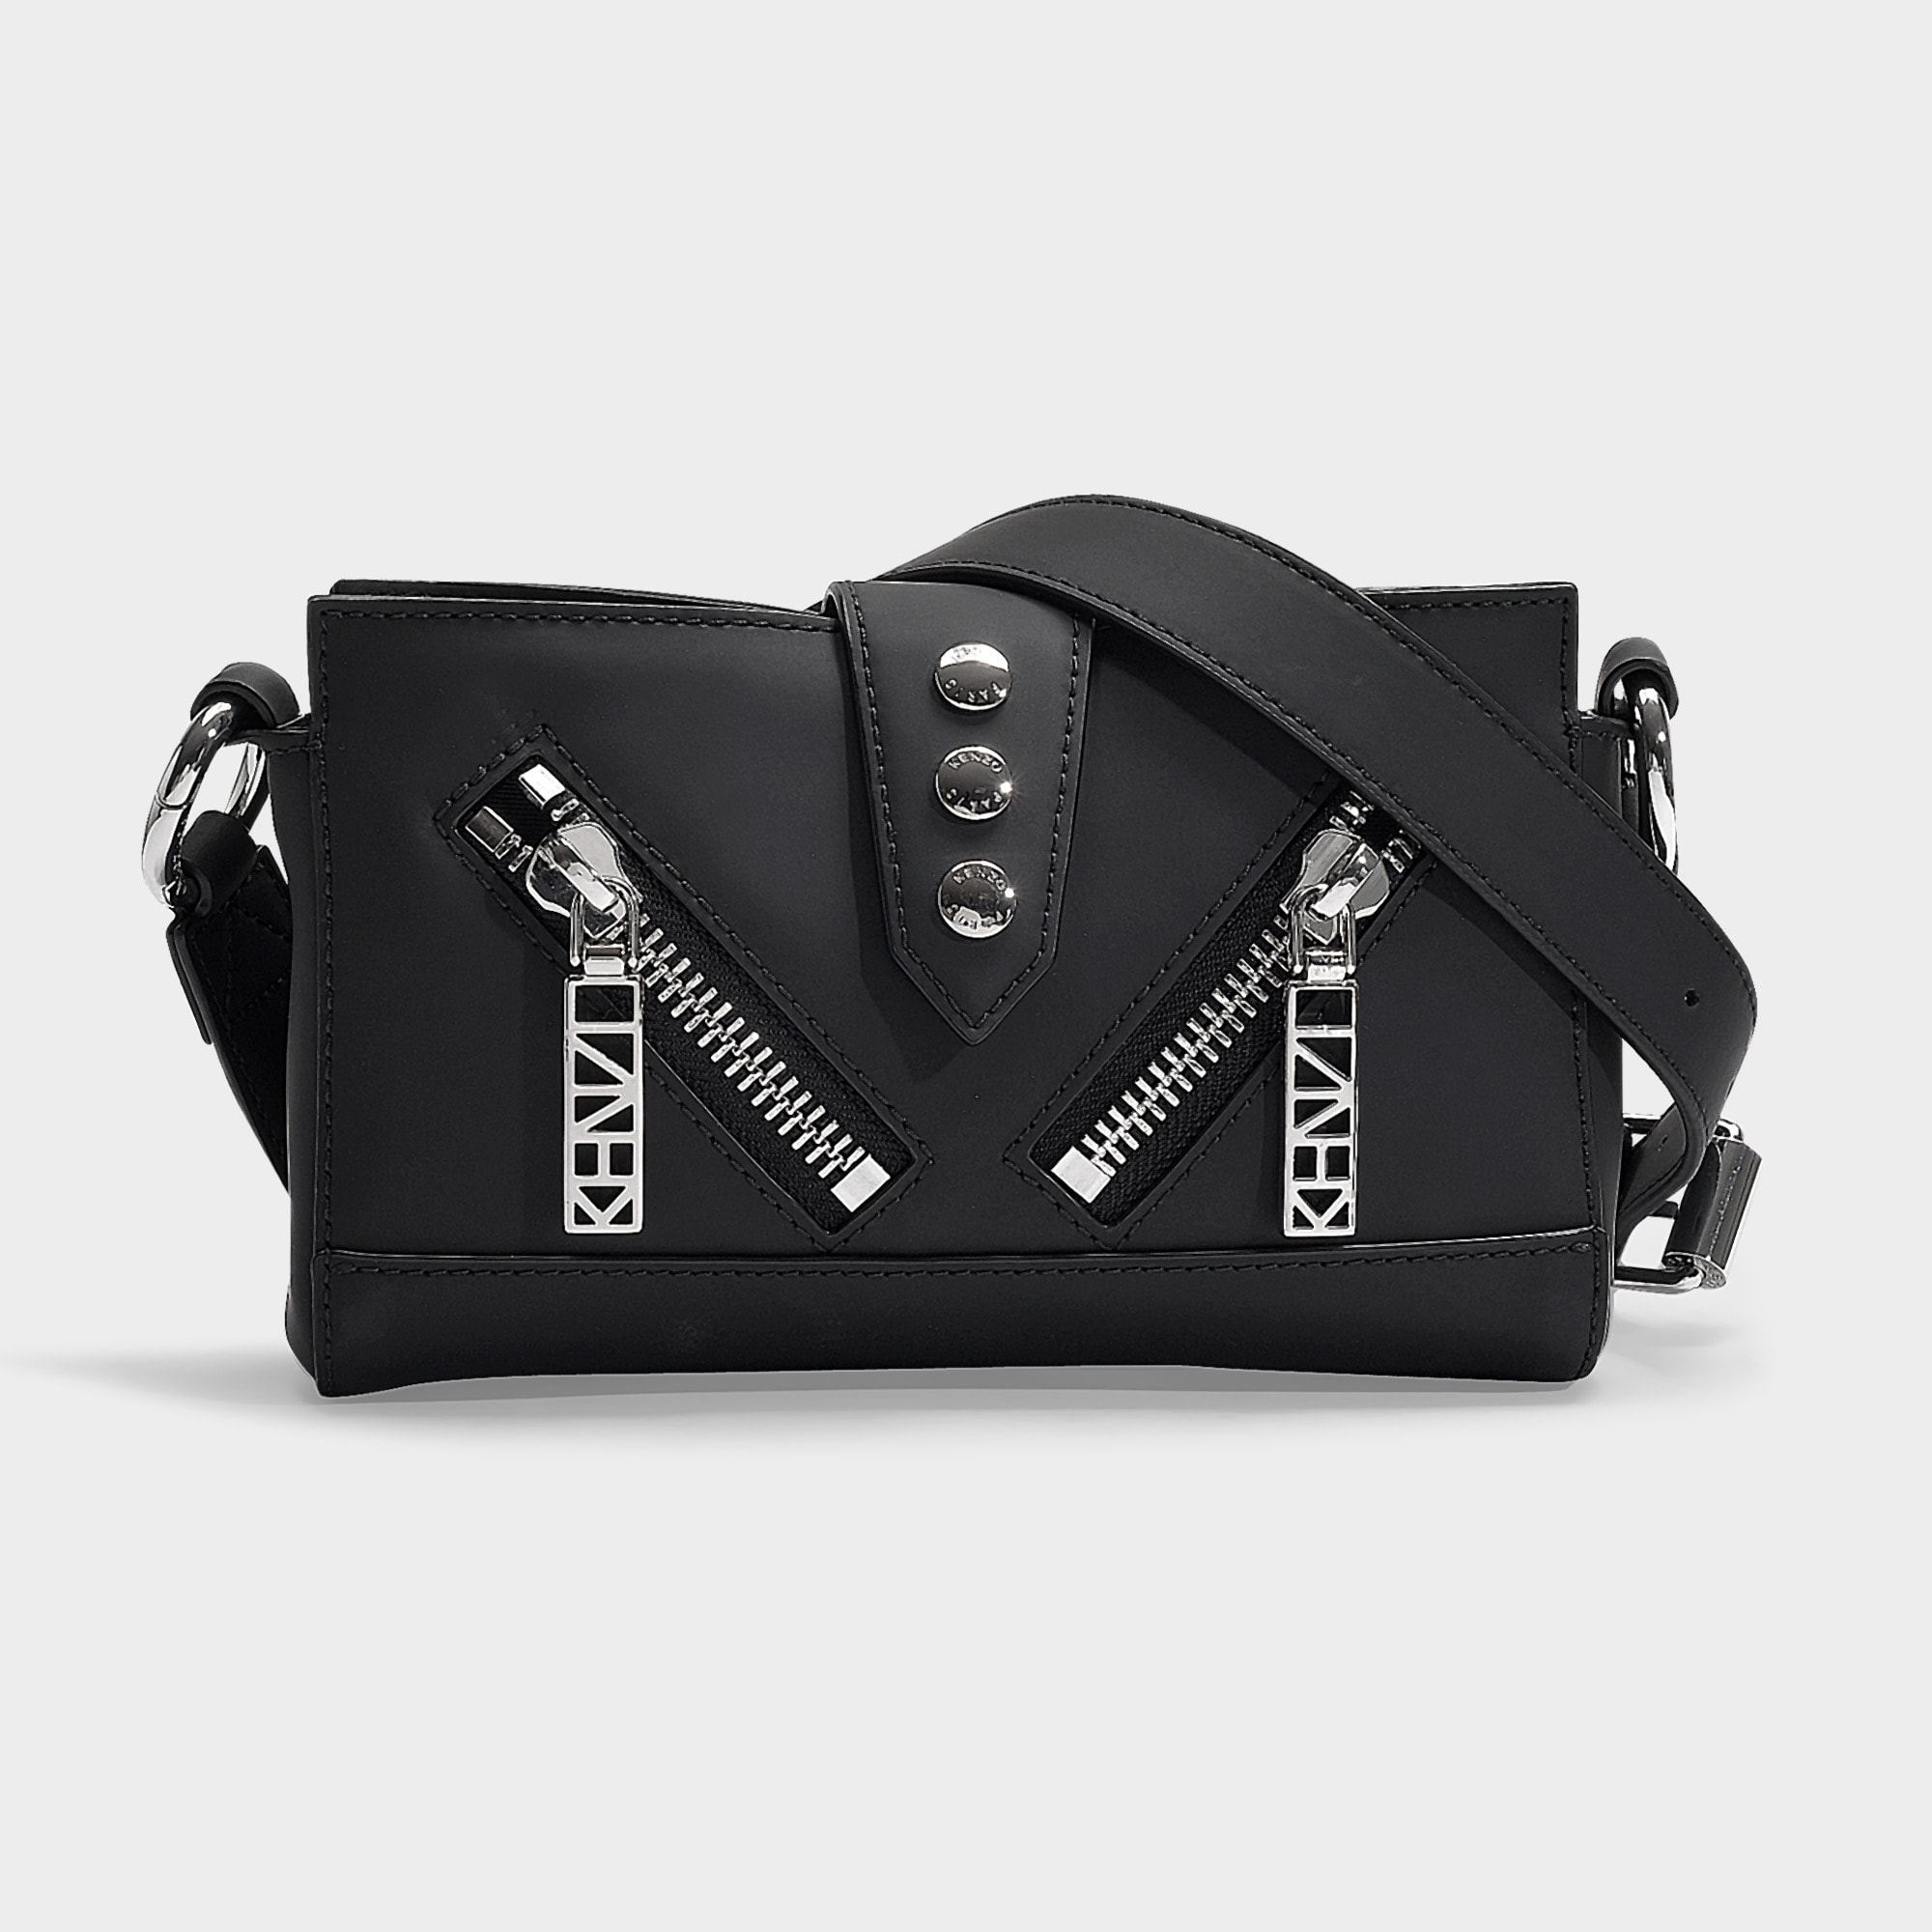 6bc768160 Kenzo | Kalifornia Bum Bag In Black Calfskin | ModeSens